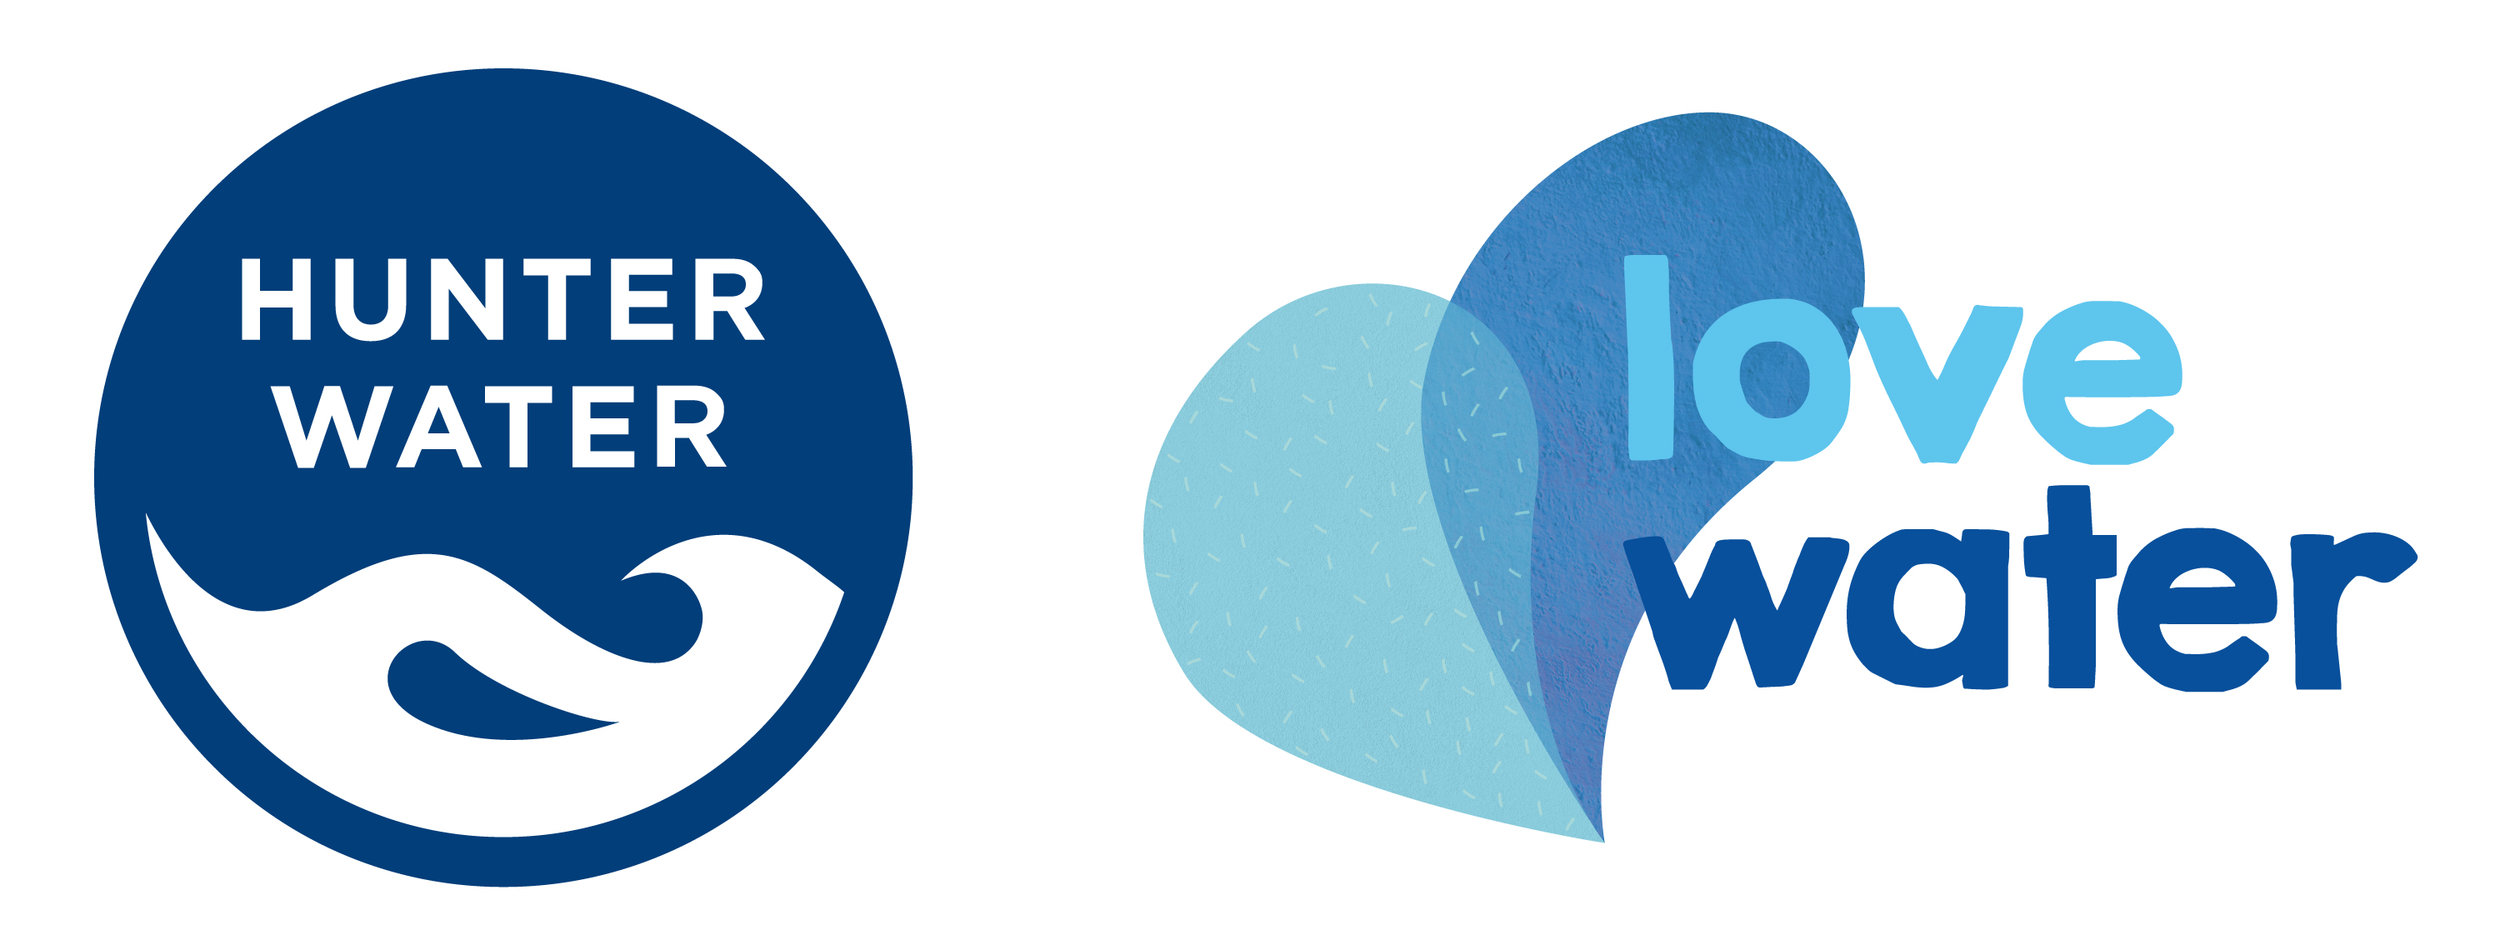 HunterWater_LoveWater_Logo_RGB.JPG